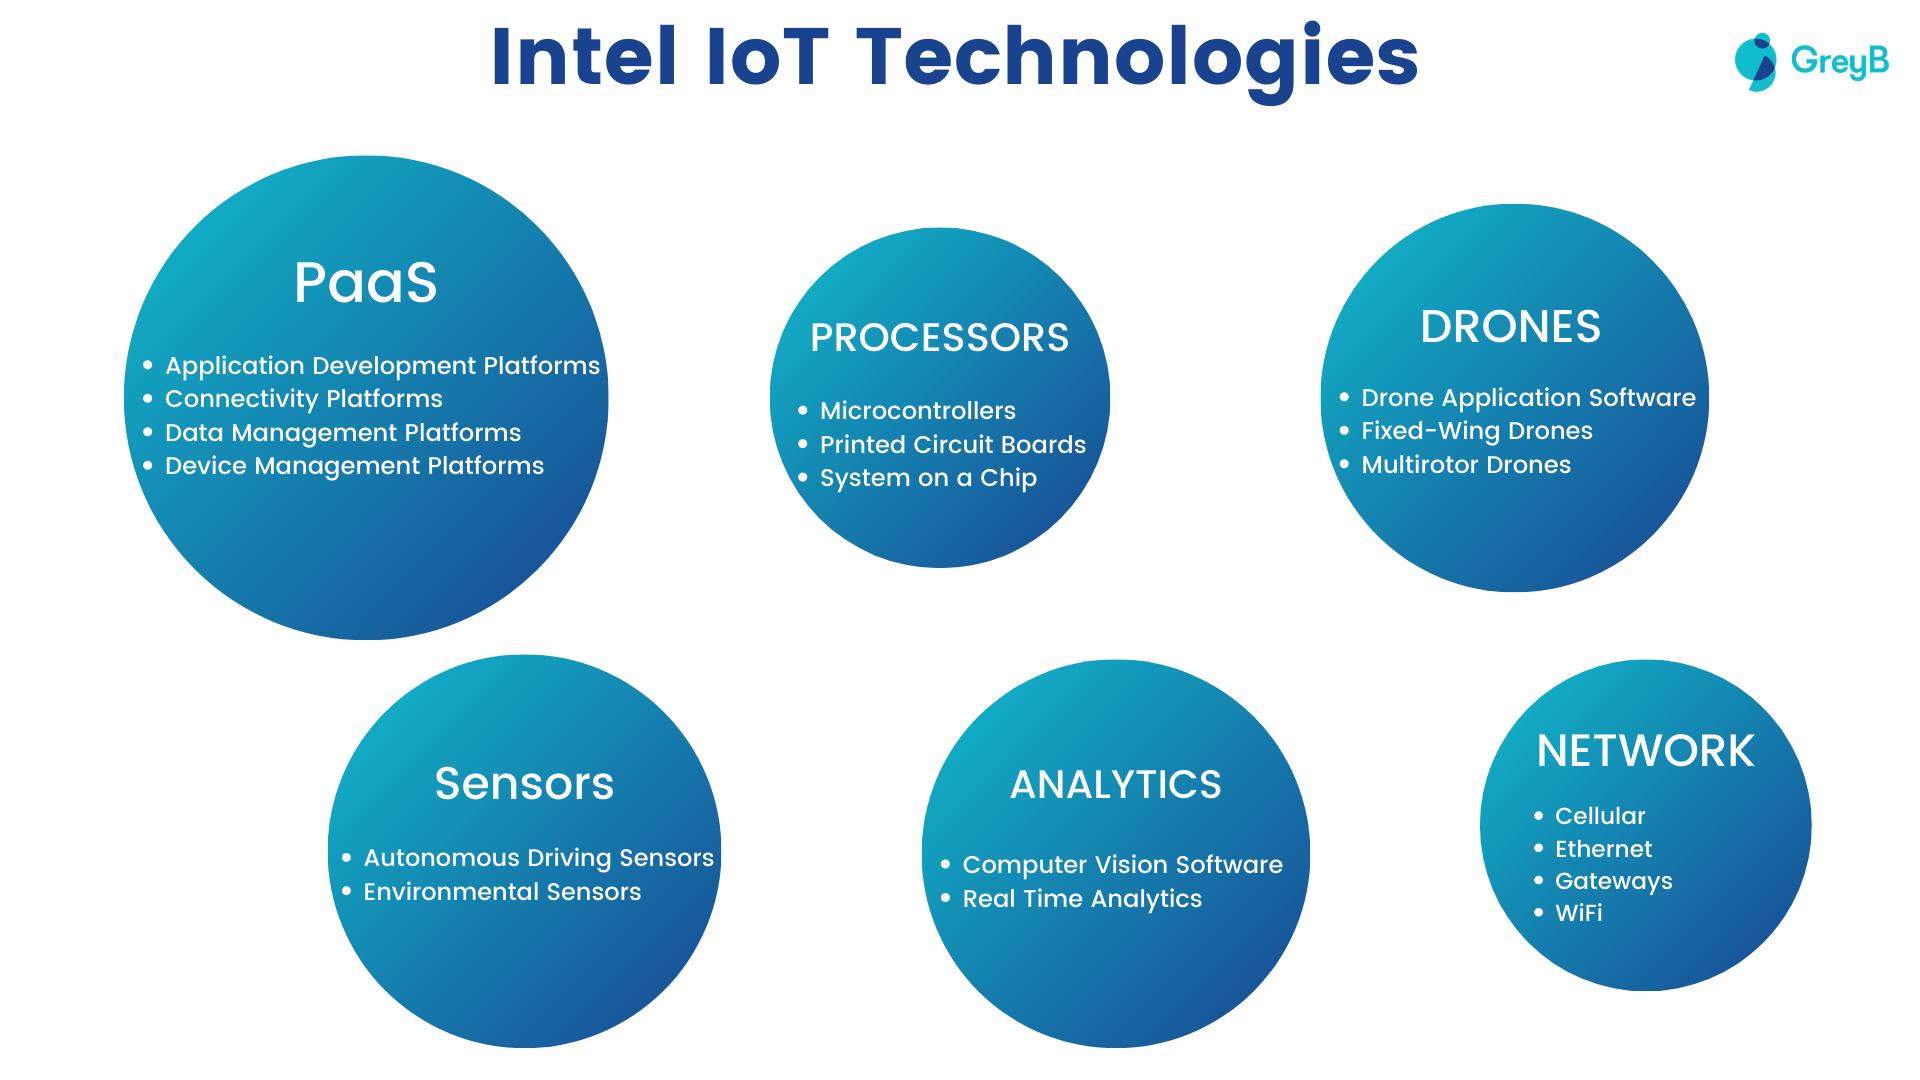 Intel IoT Technologies